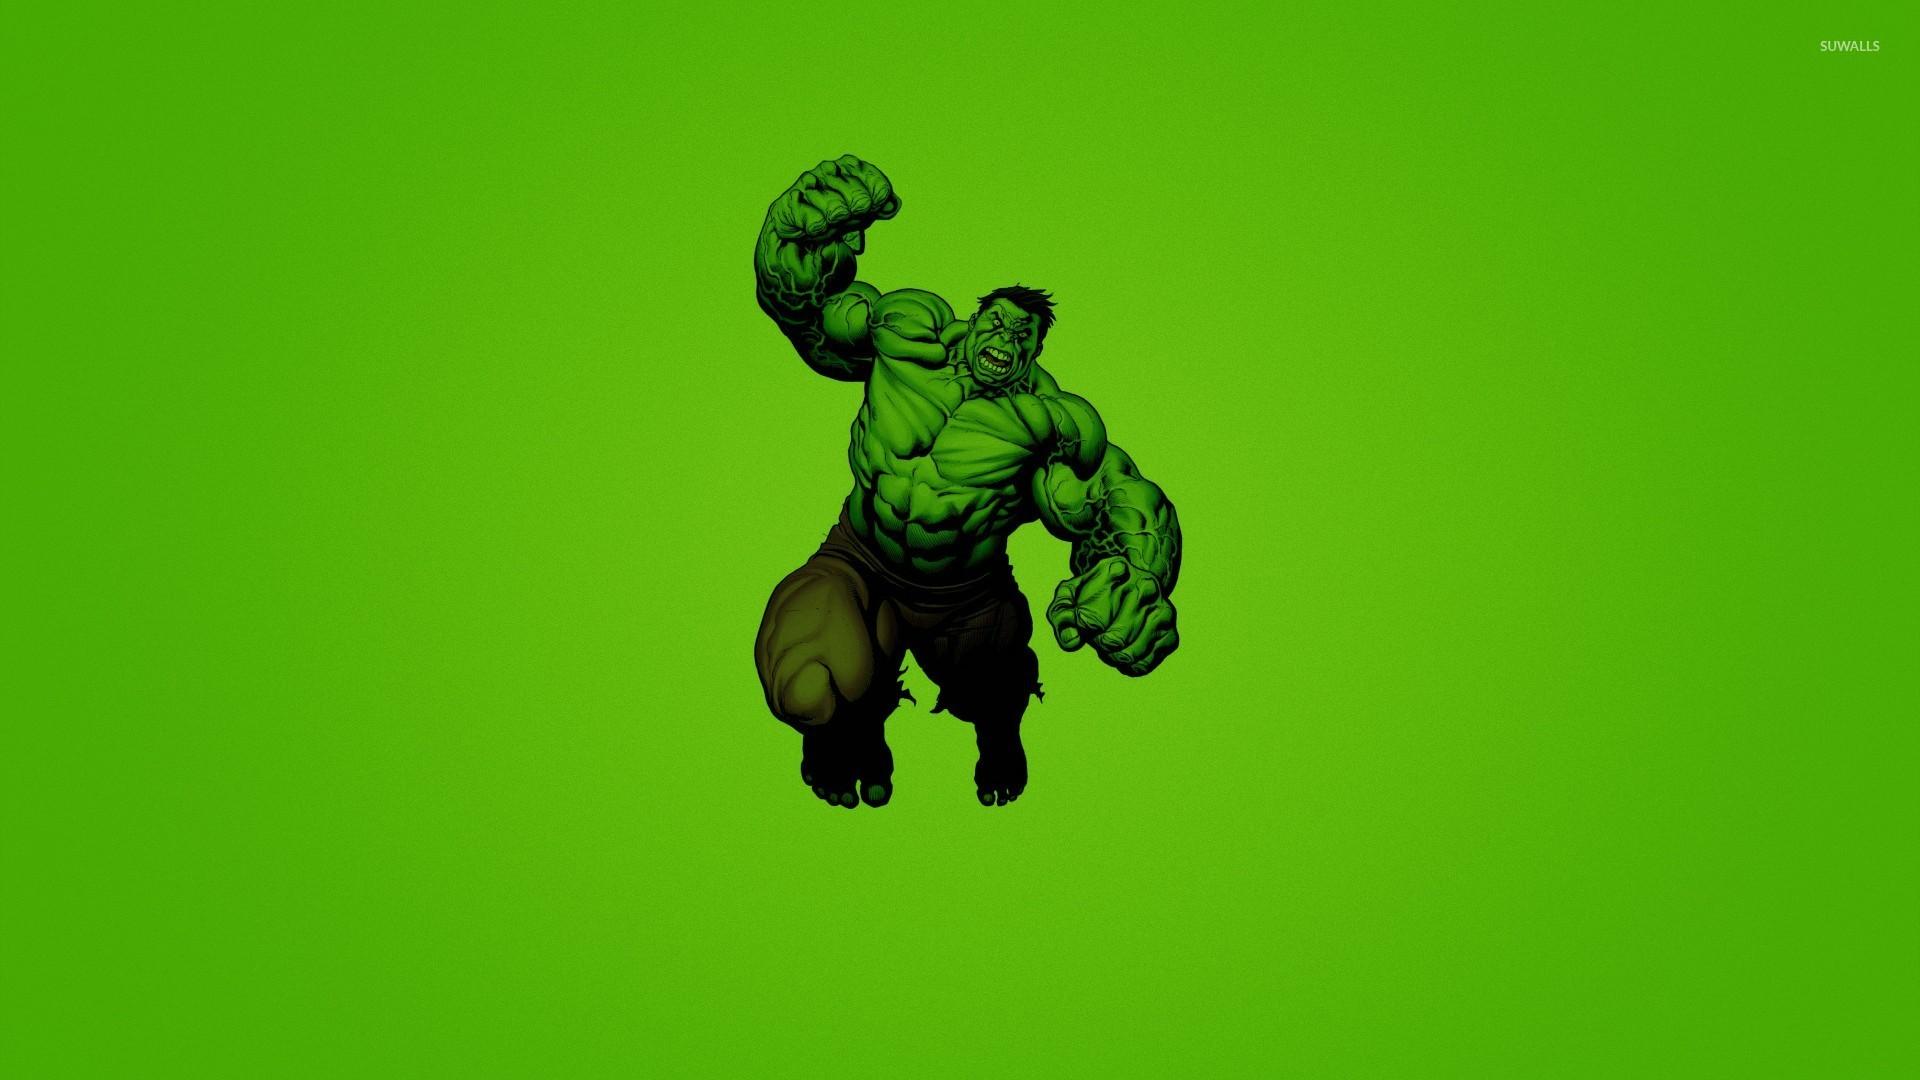 Hulk wallpaper   Comic wallpapers   43682 1920x1080